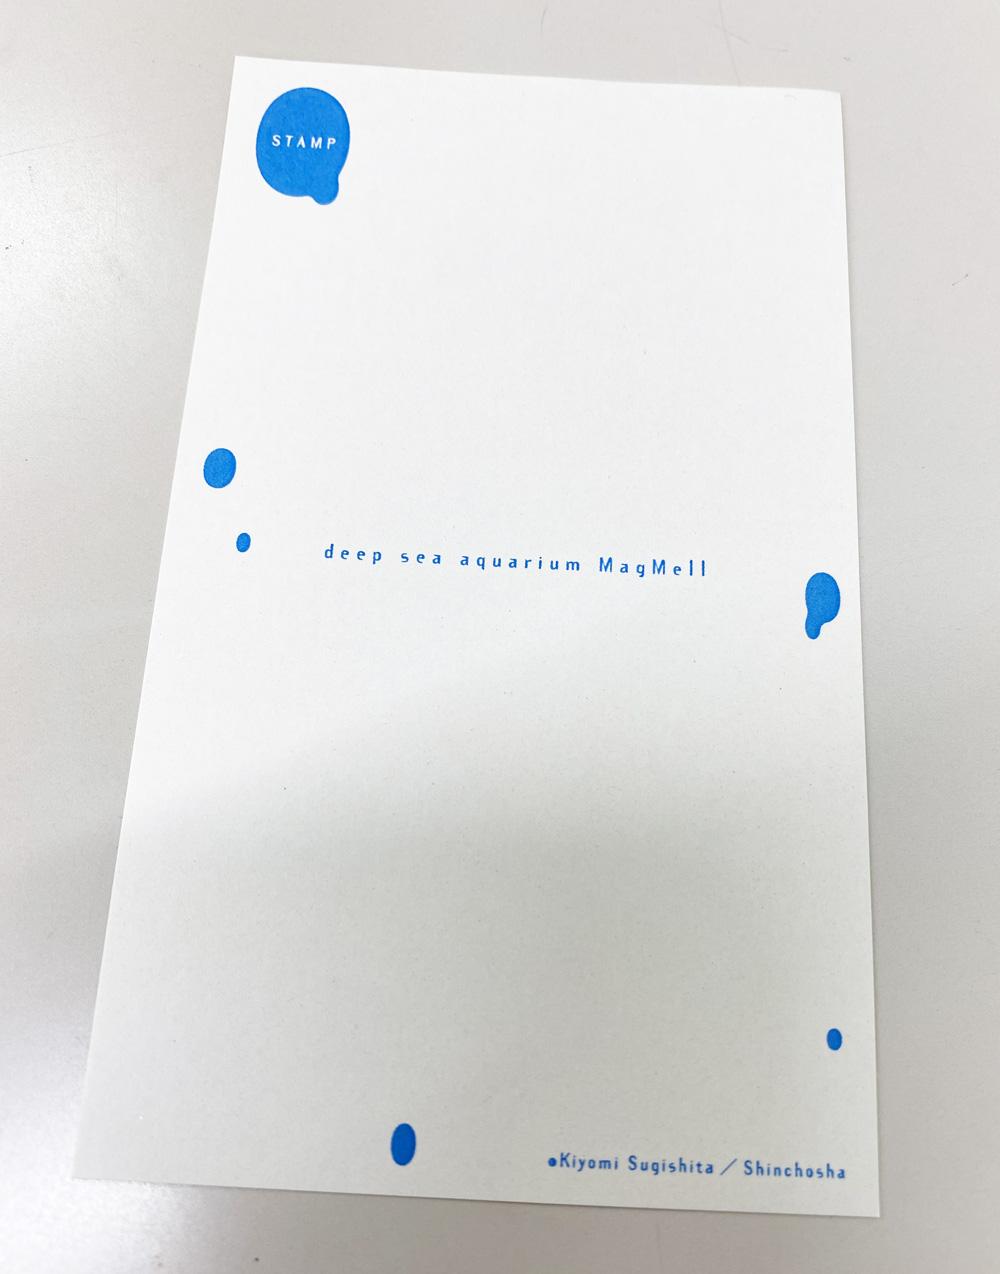 f:id:kuragebunch:20210210201222j:plain